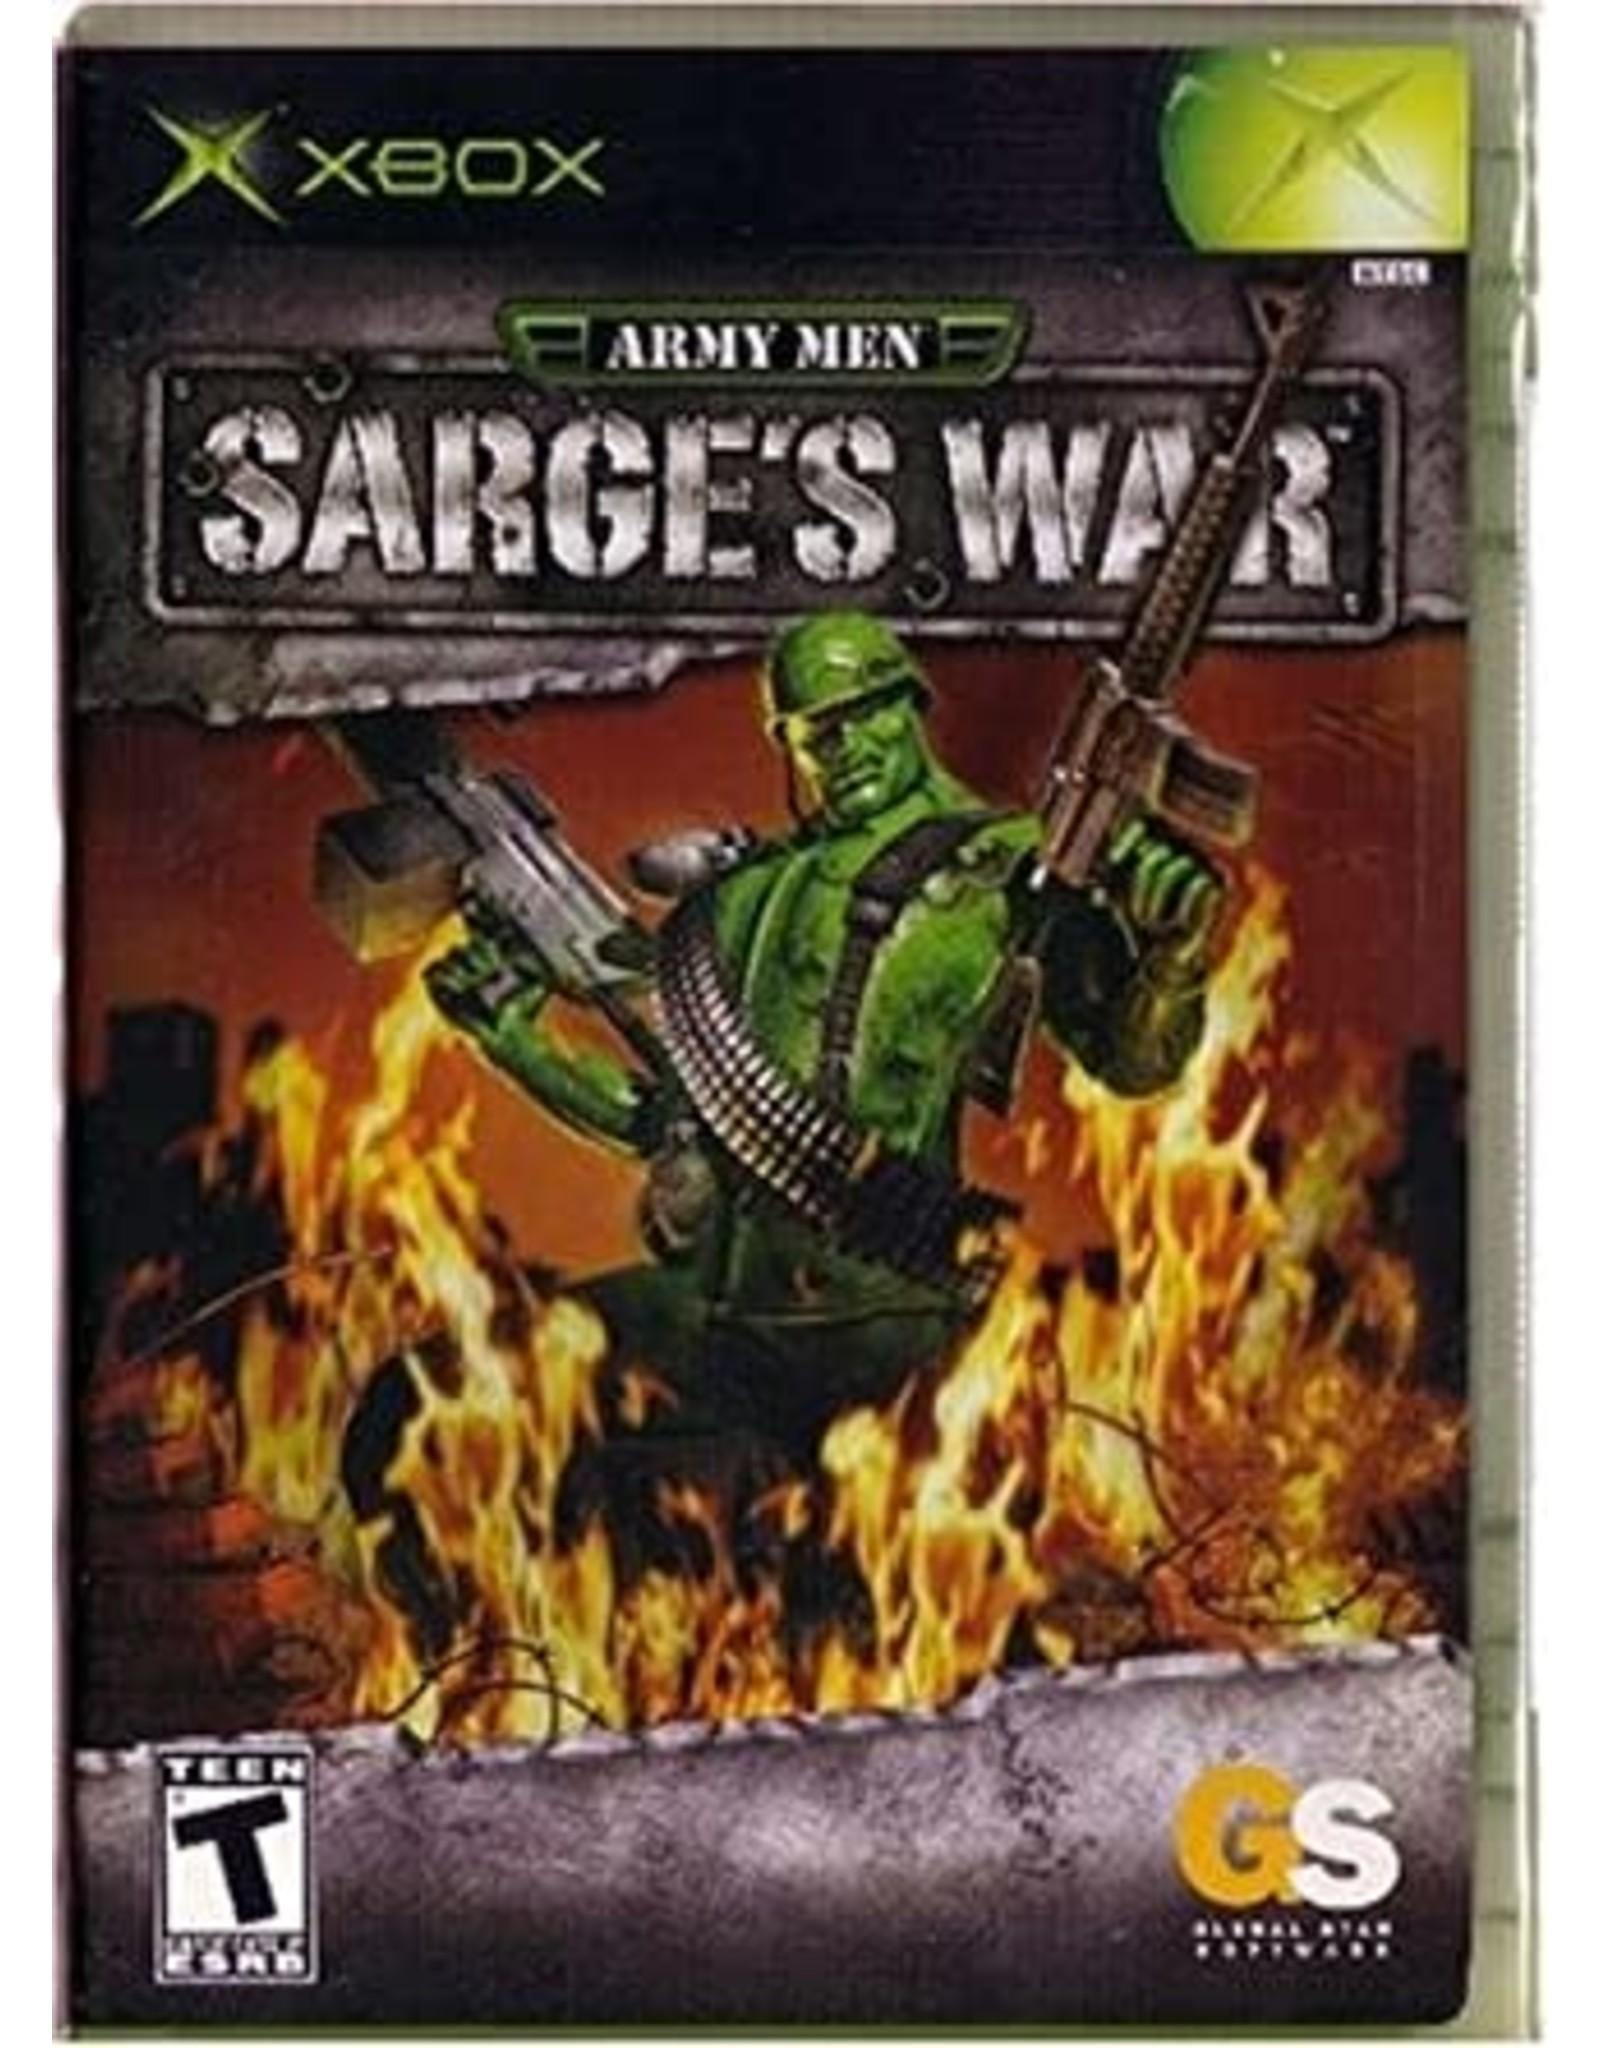 Xbox Army Men Sarge's War (No Manual)